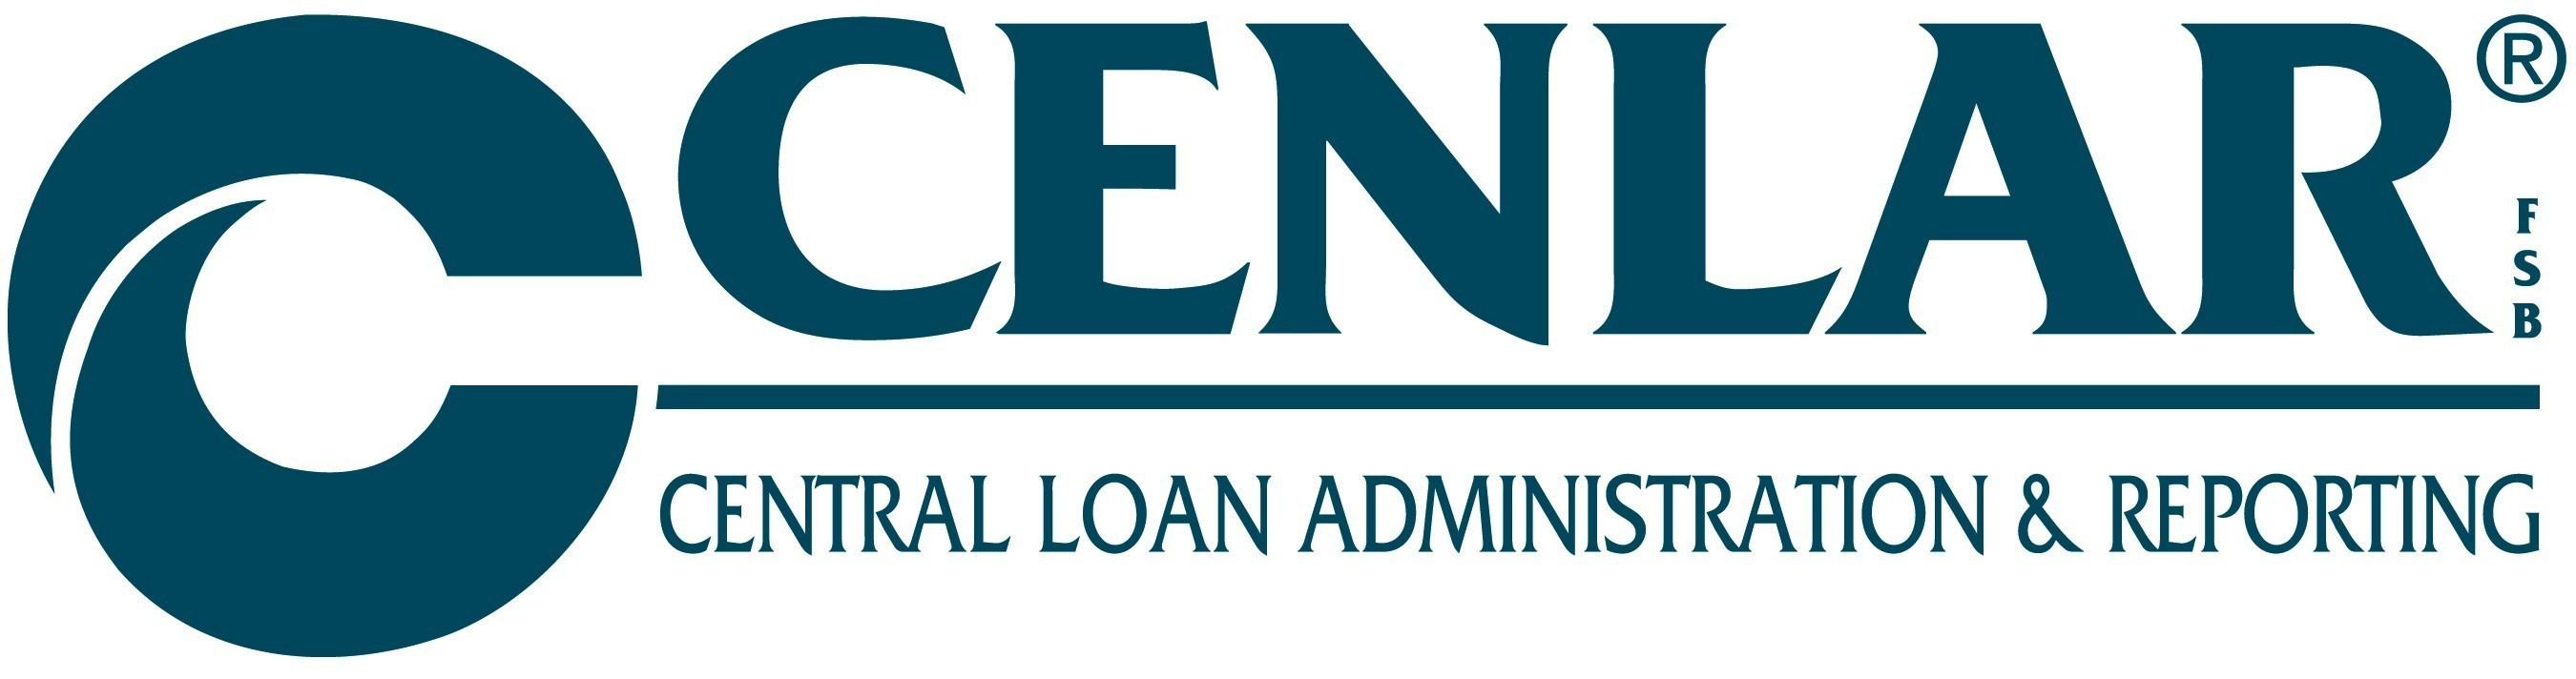 www.cenlar.com